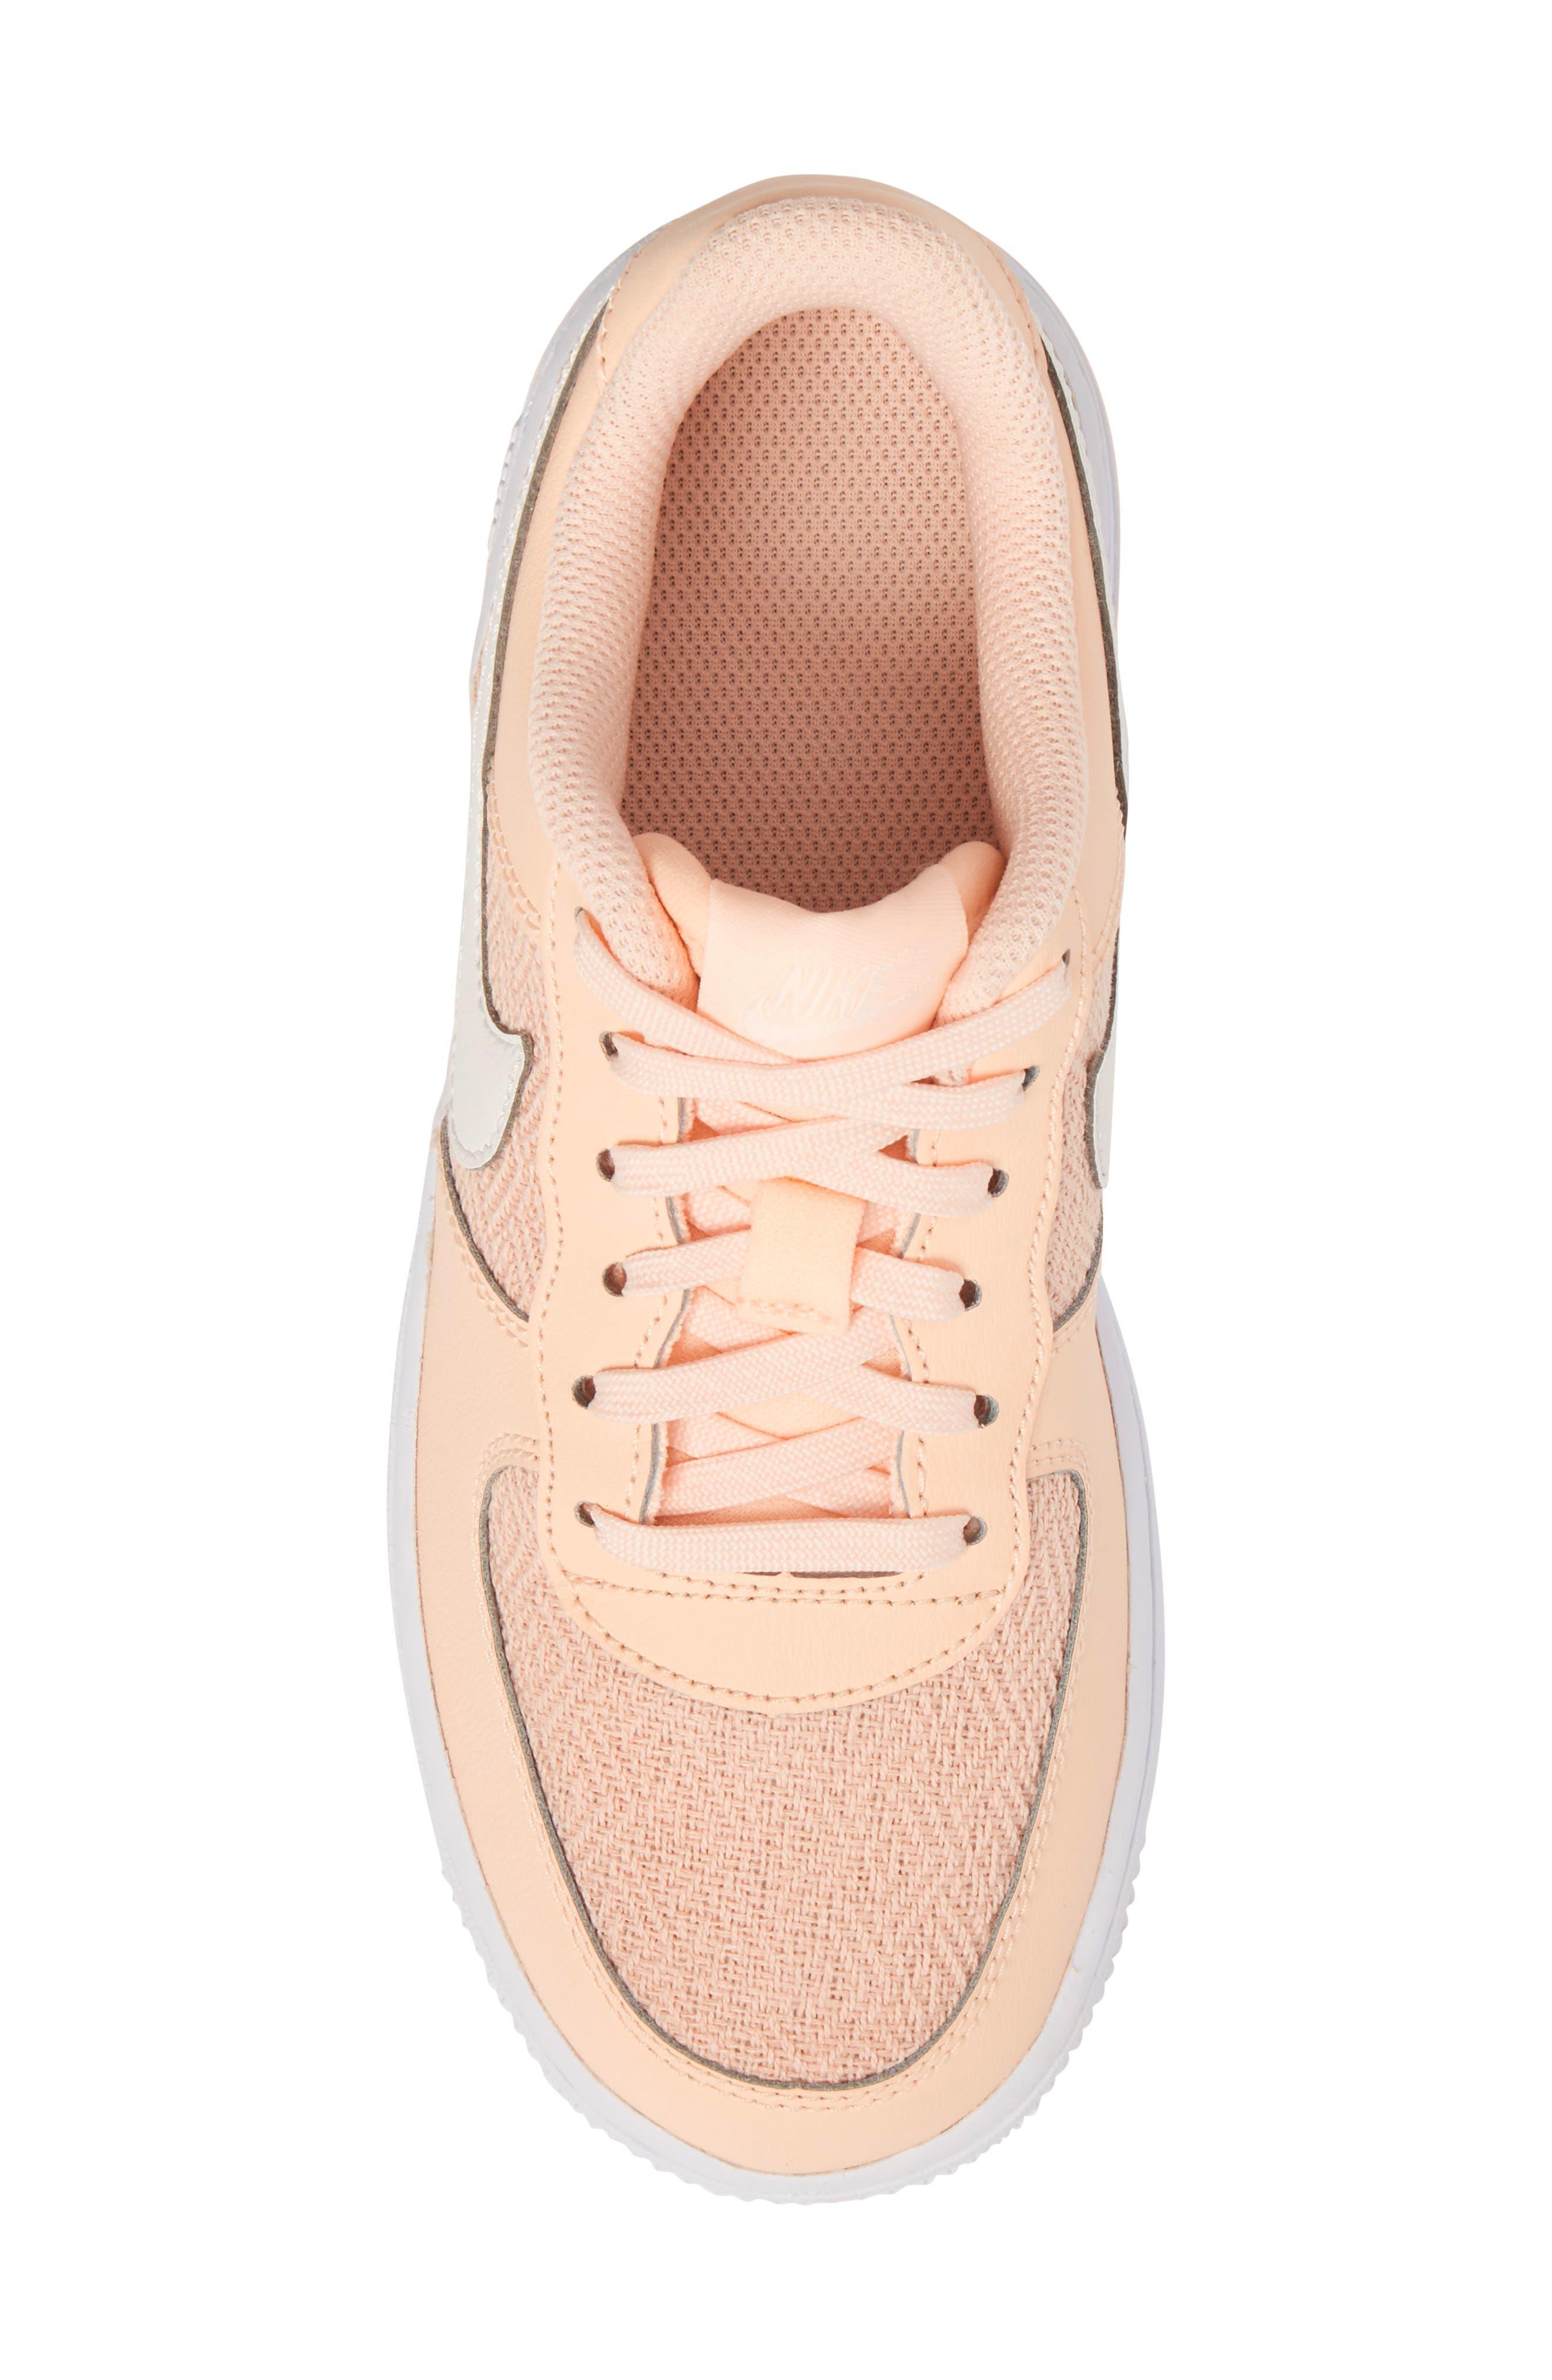 Air Force 1 LV8 Sneaker,                             Alternate thumbnail 5, color,                             Crimson Tint/ Sail/ White